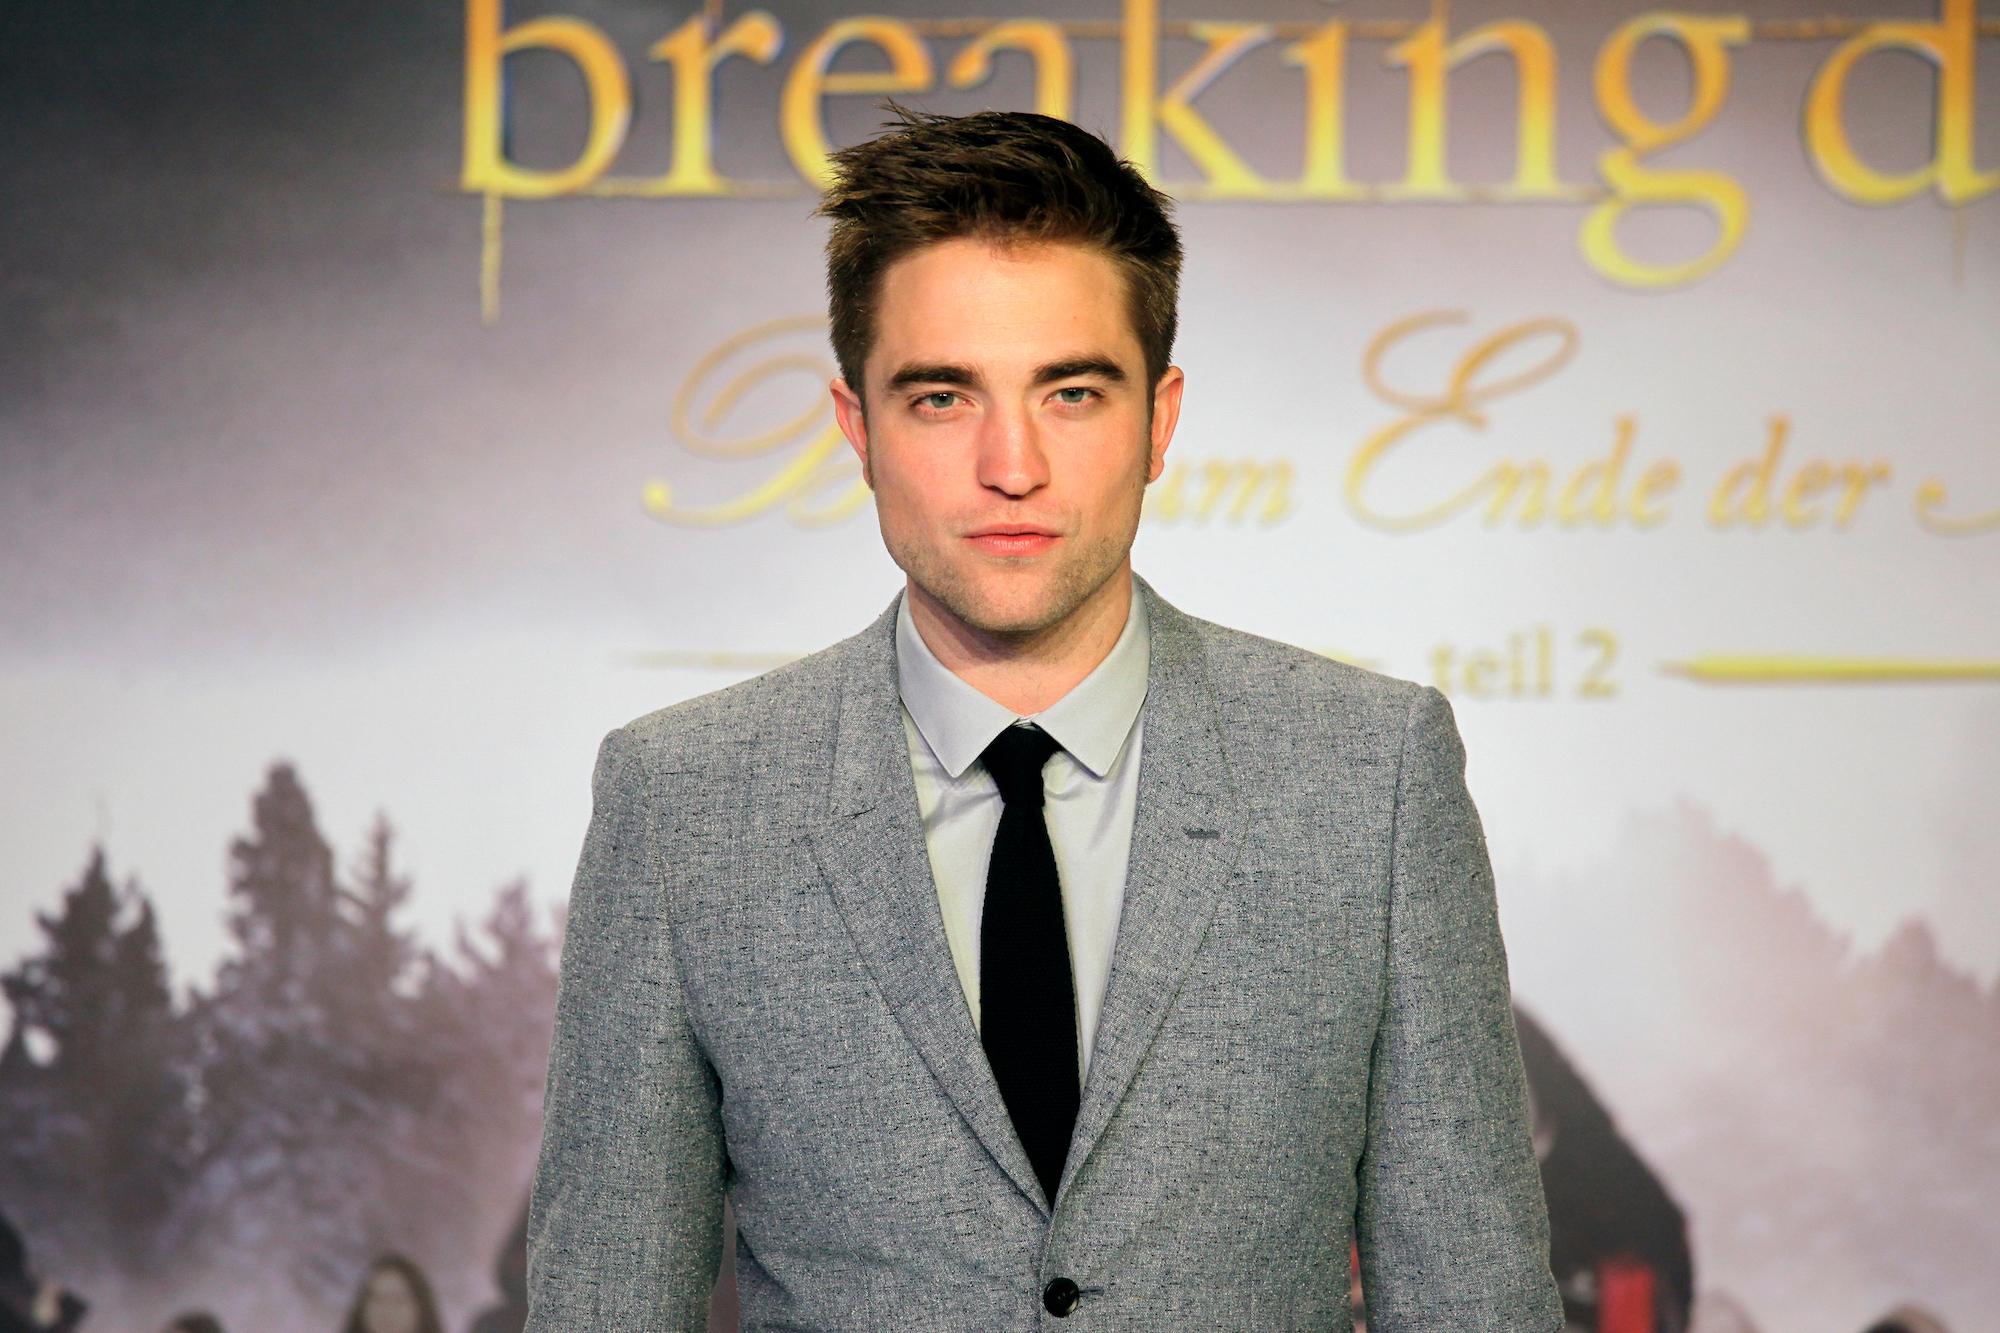 Robert Pattinson at the European premiere for 'Twilight Saga: Breaking Dawn Part 2'